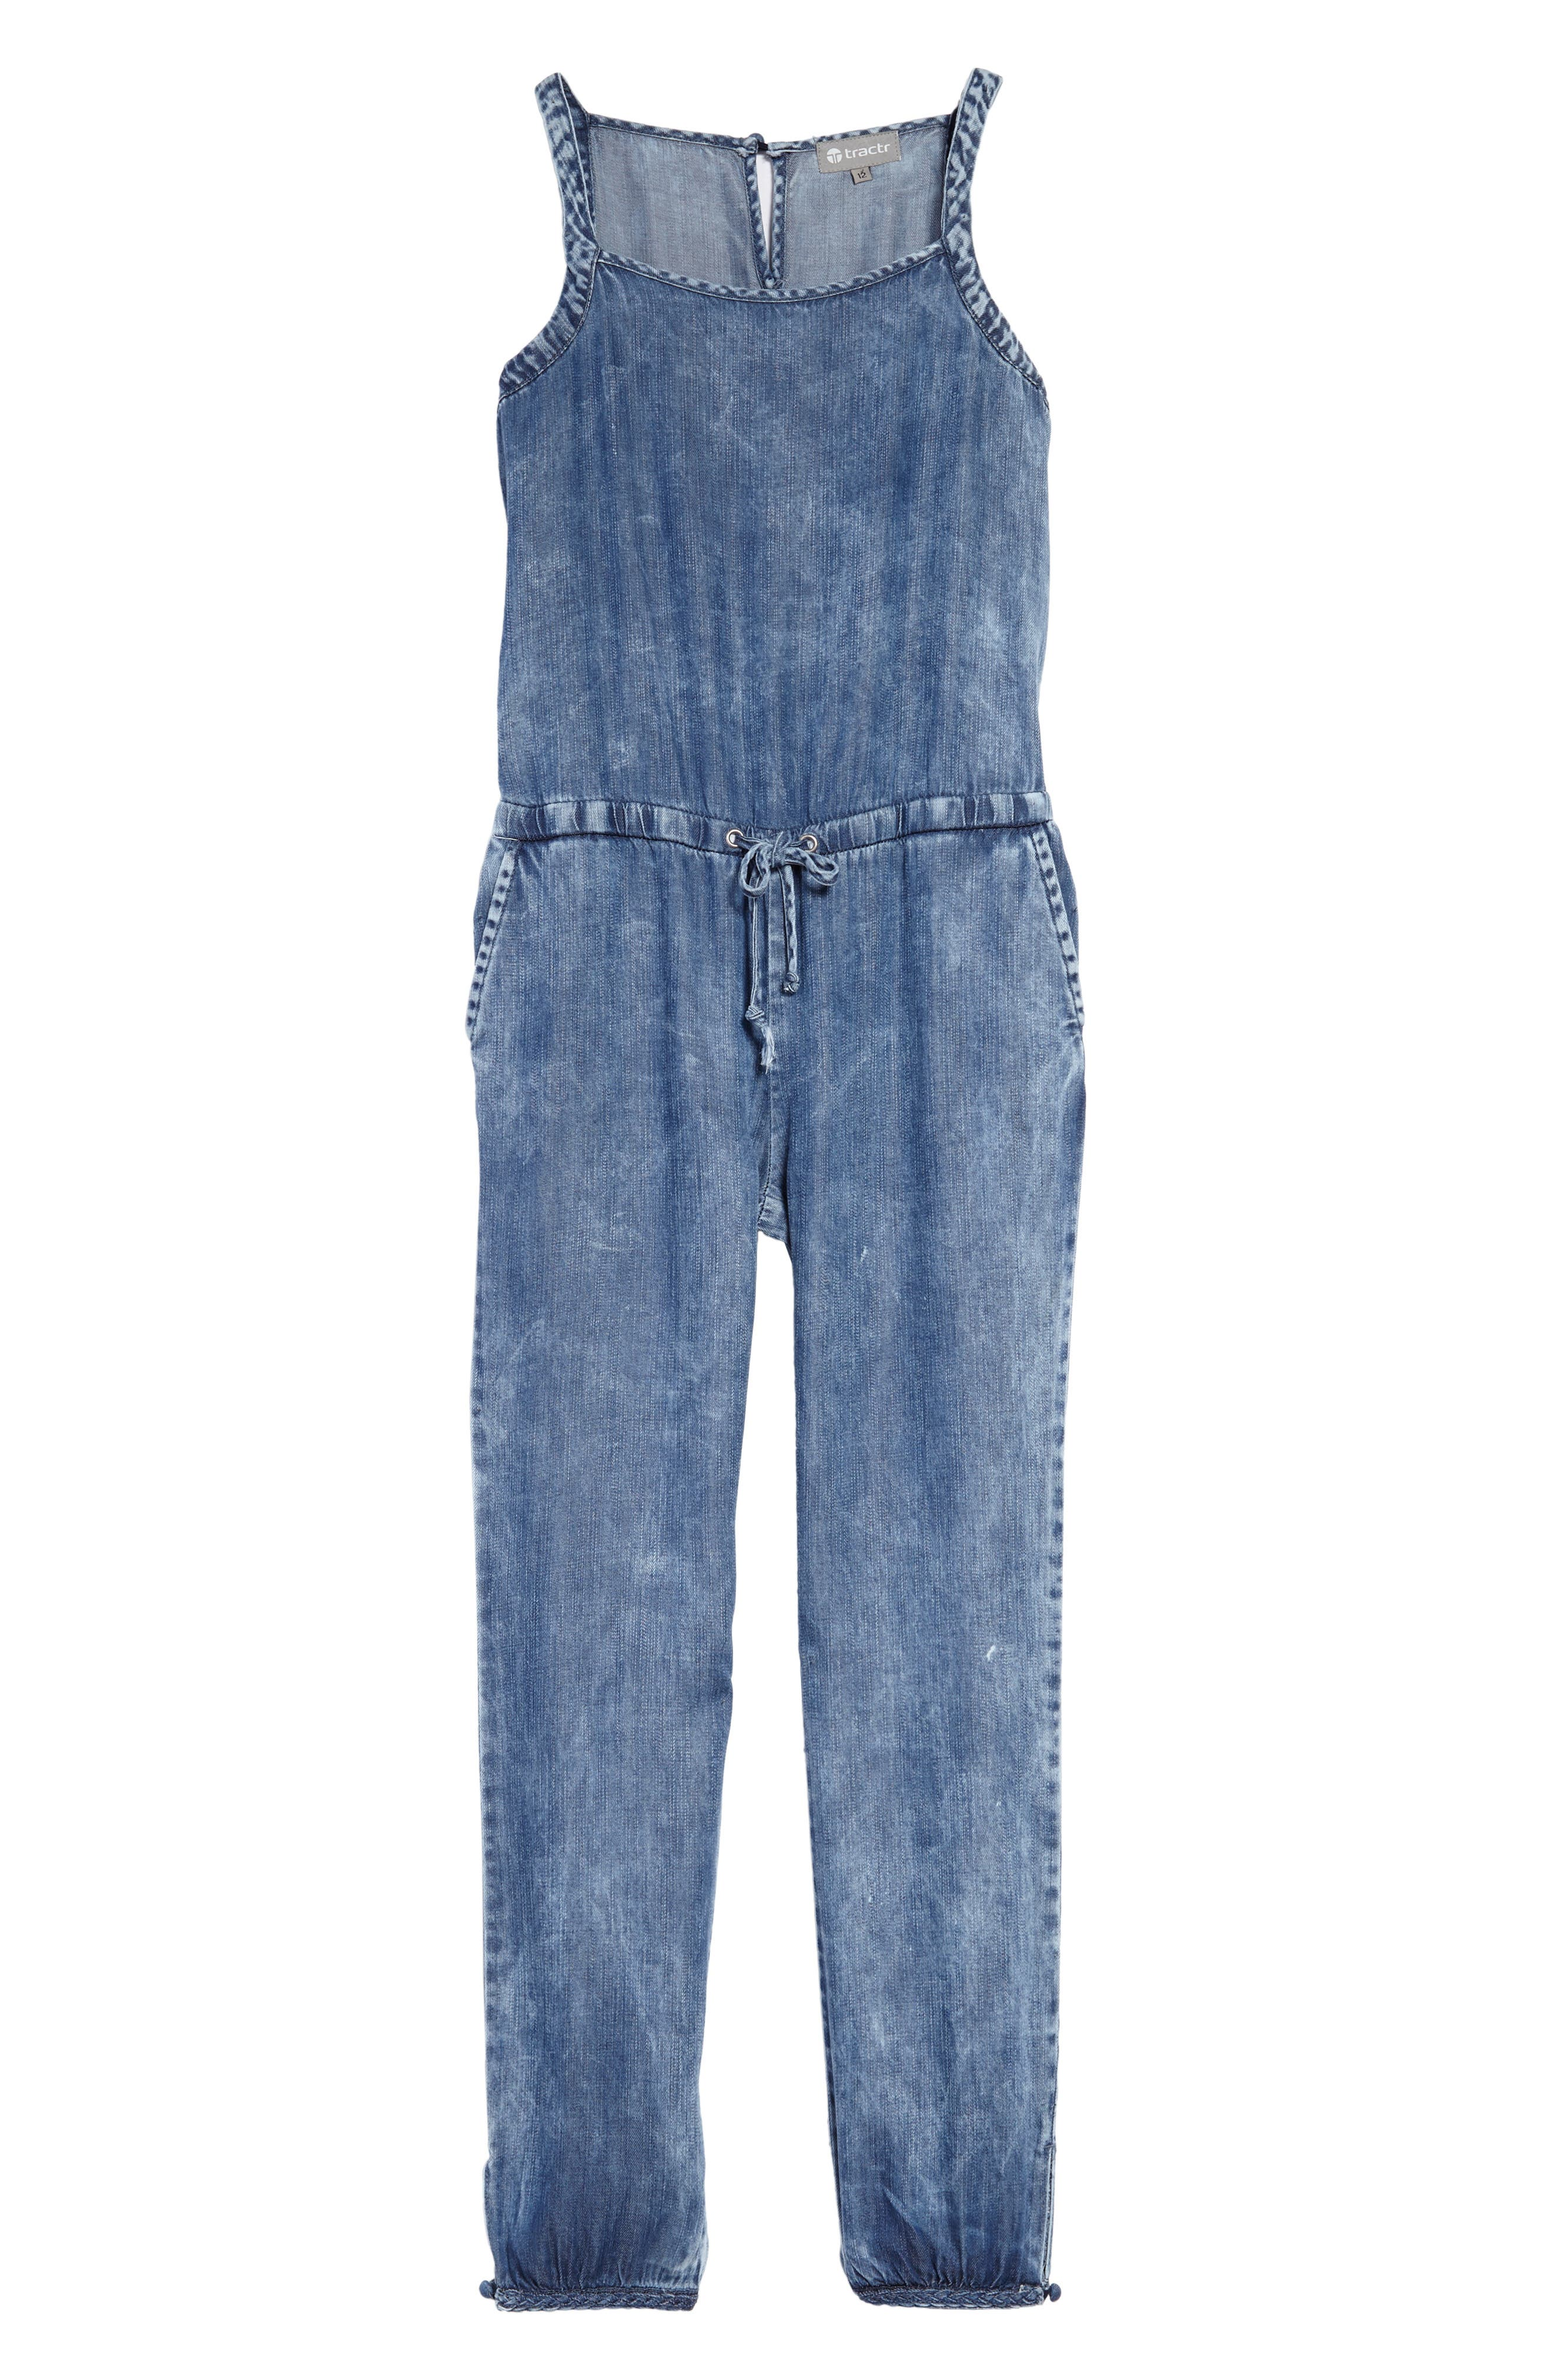 Chambray Jumpsuit,                         Main,                         color, Indigo